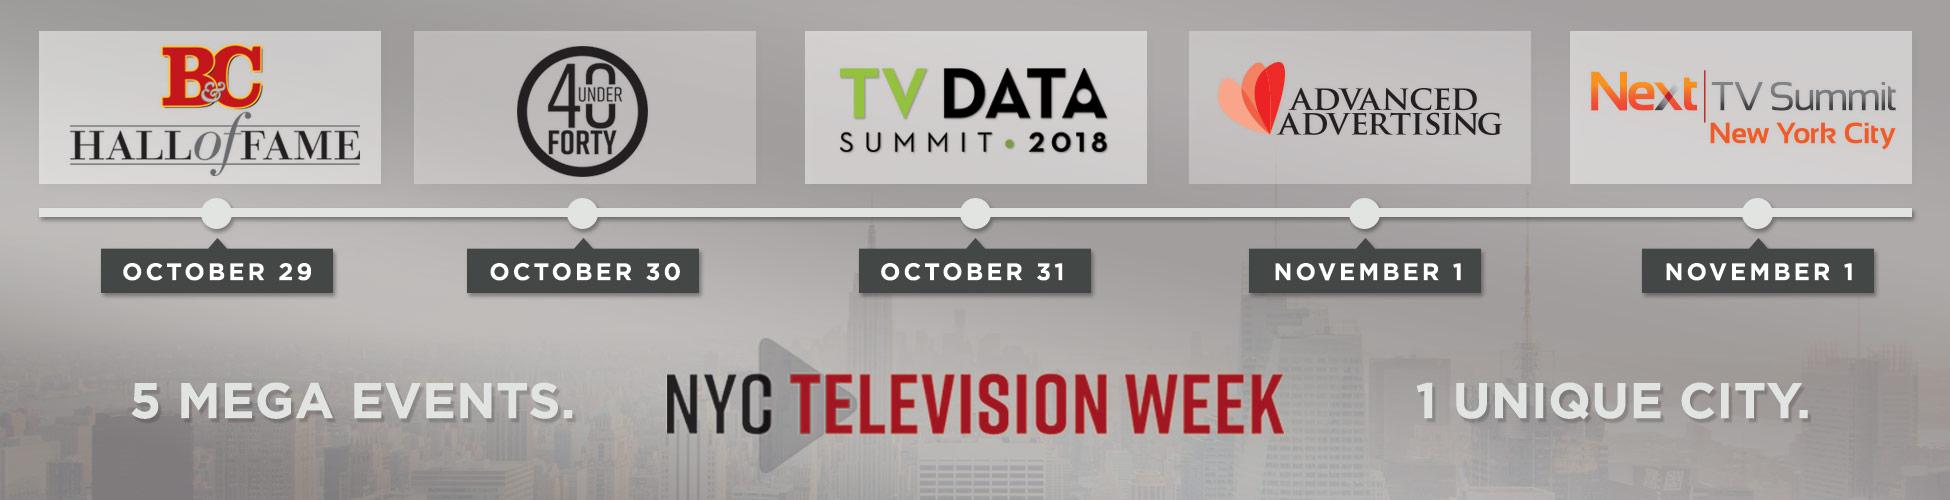 NYC Television Week: 5 Mega Events, 1 Unique City